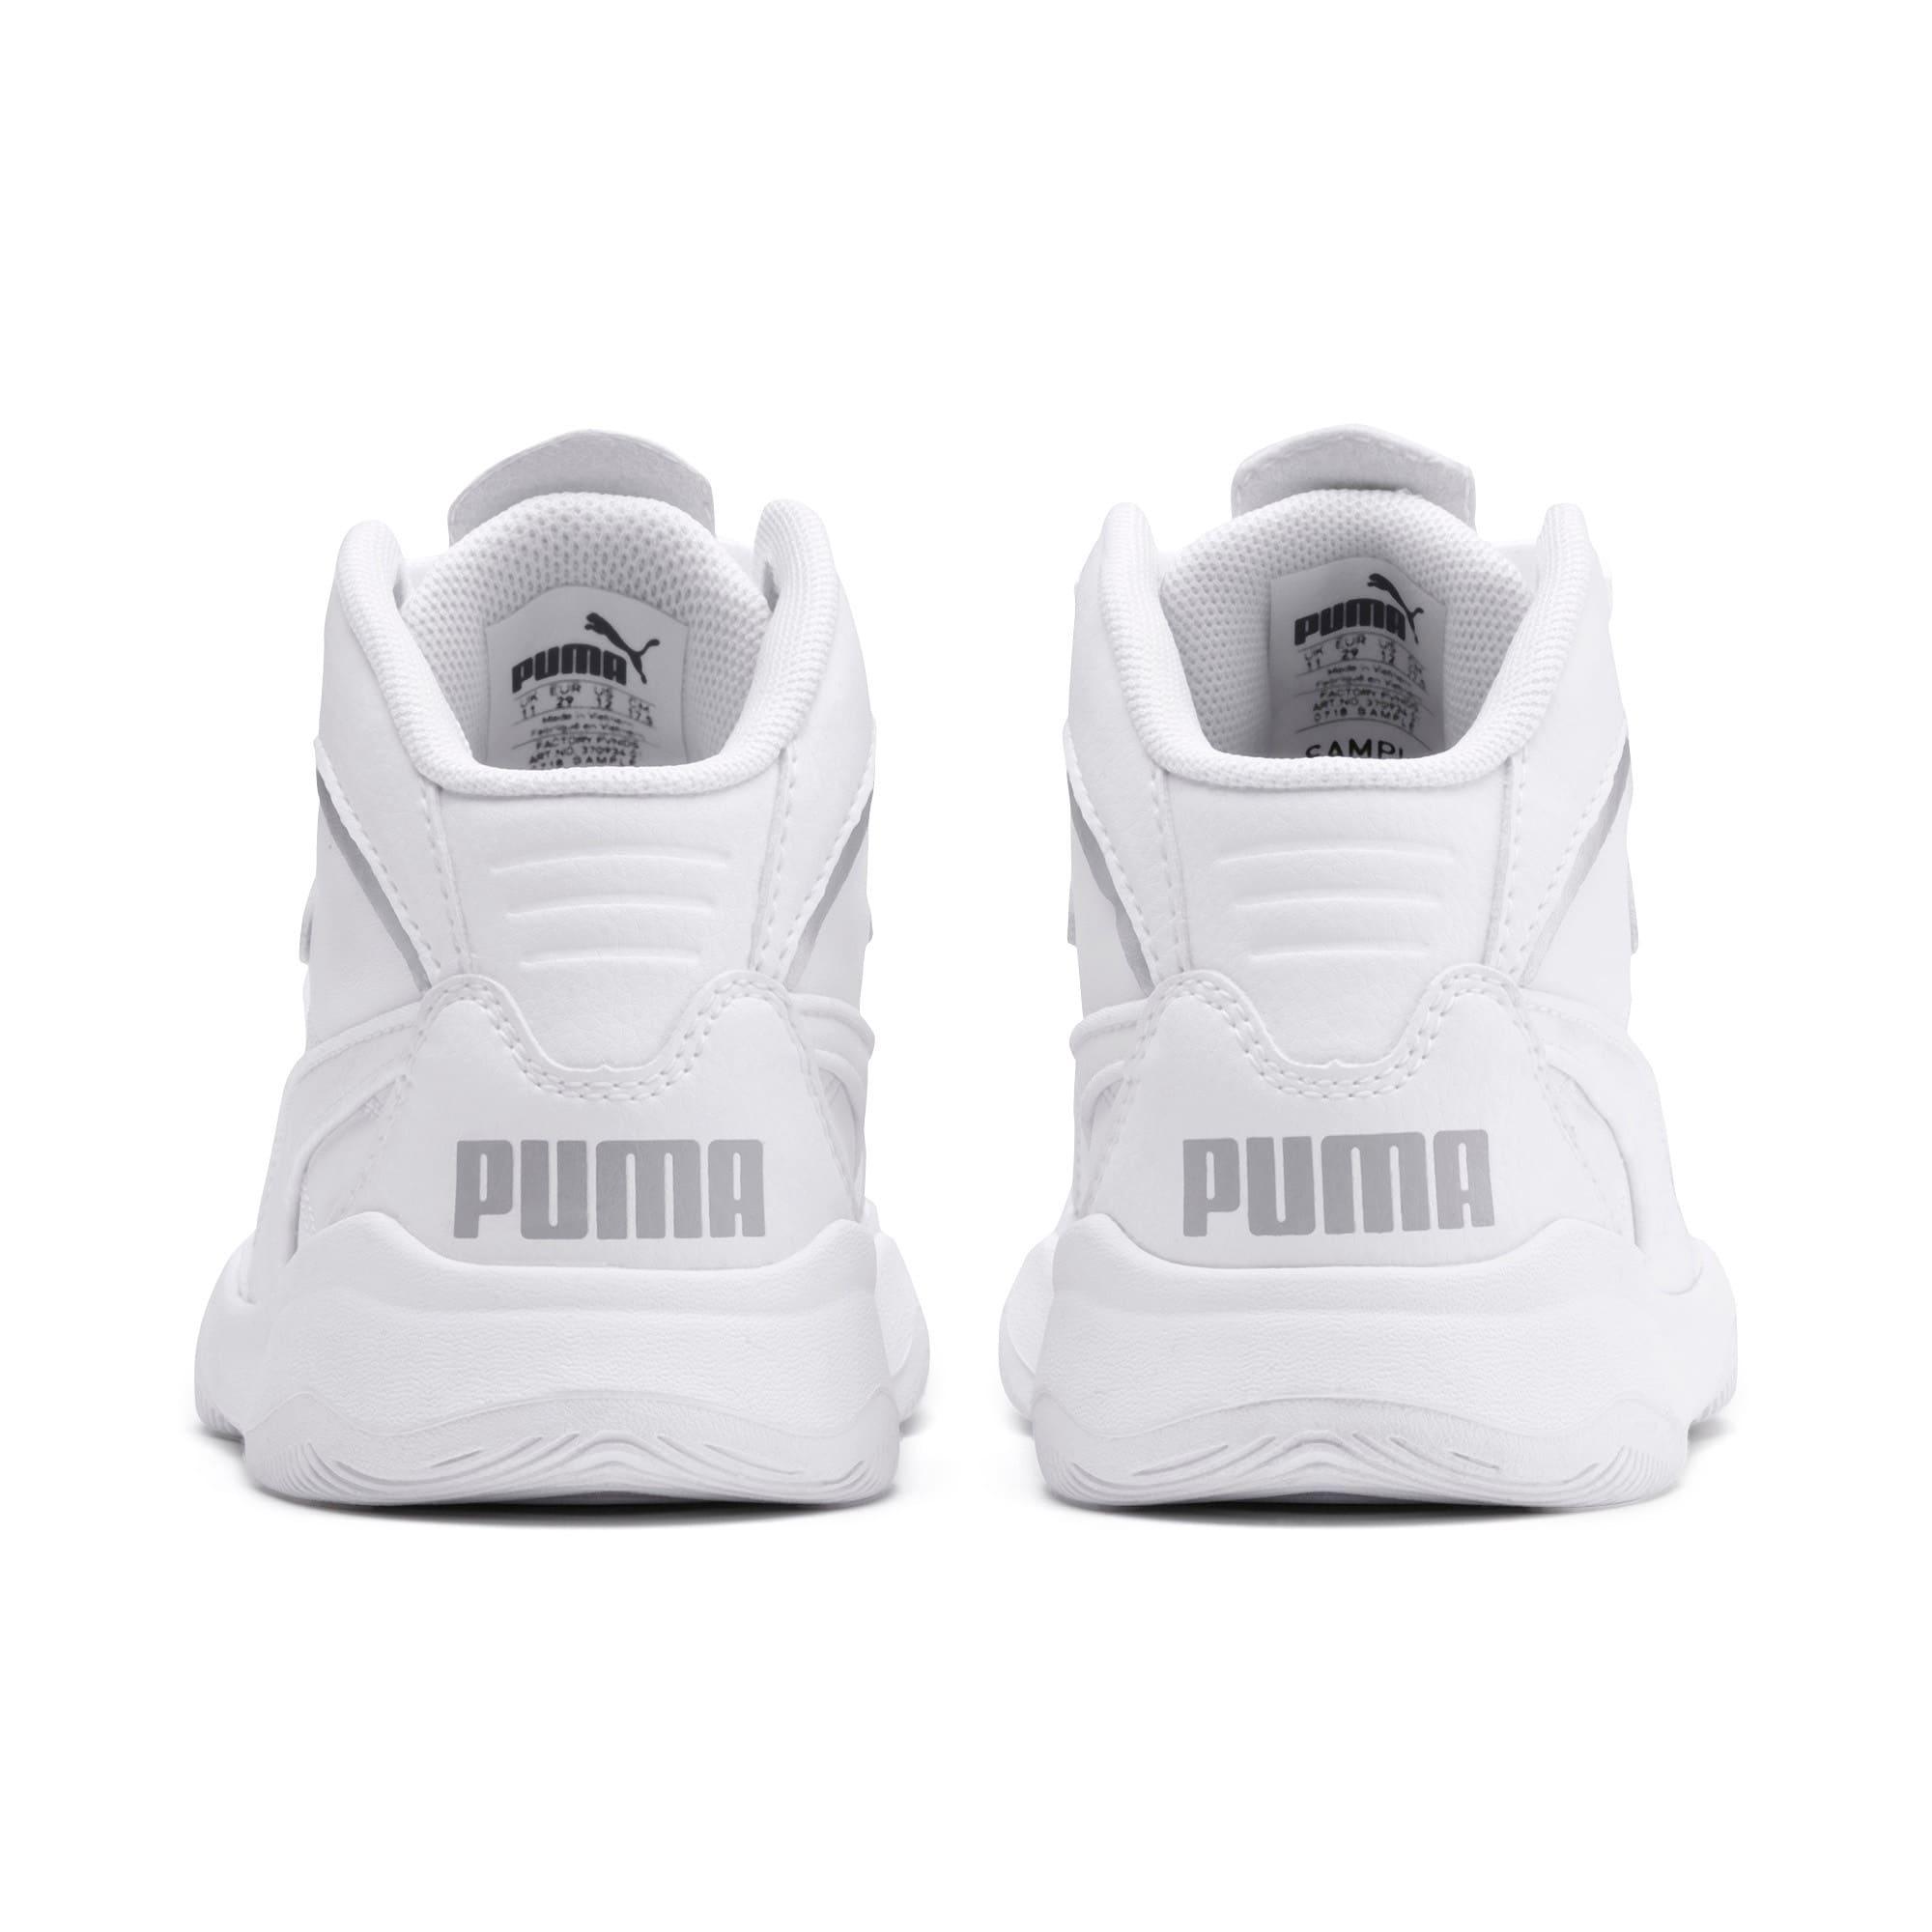 Thumbnail 3 of PUMA Rebound Playoff SL Little Kids' Shoes, Puma White-Puma Silver, medium